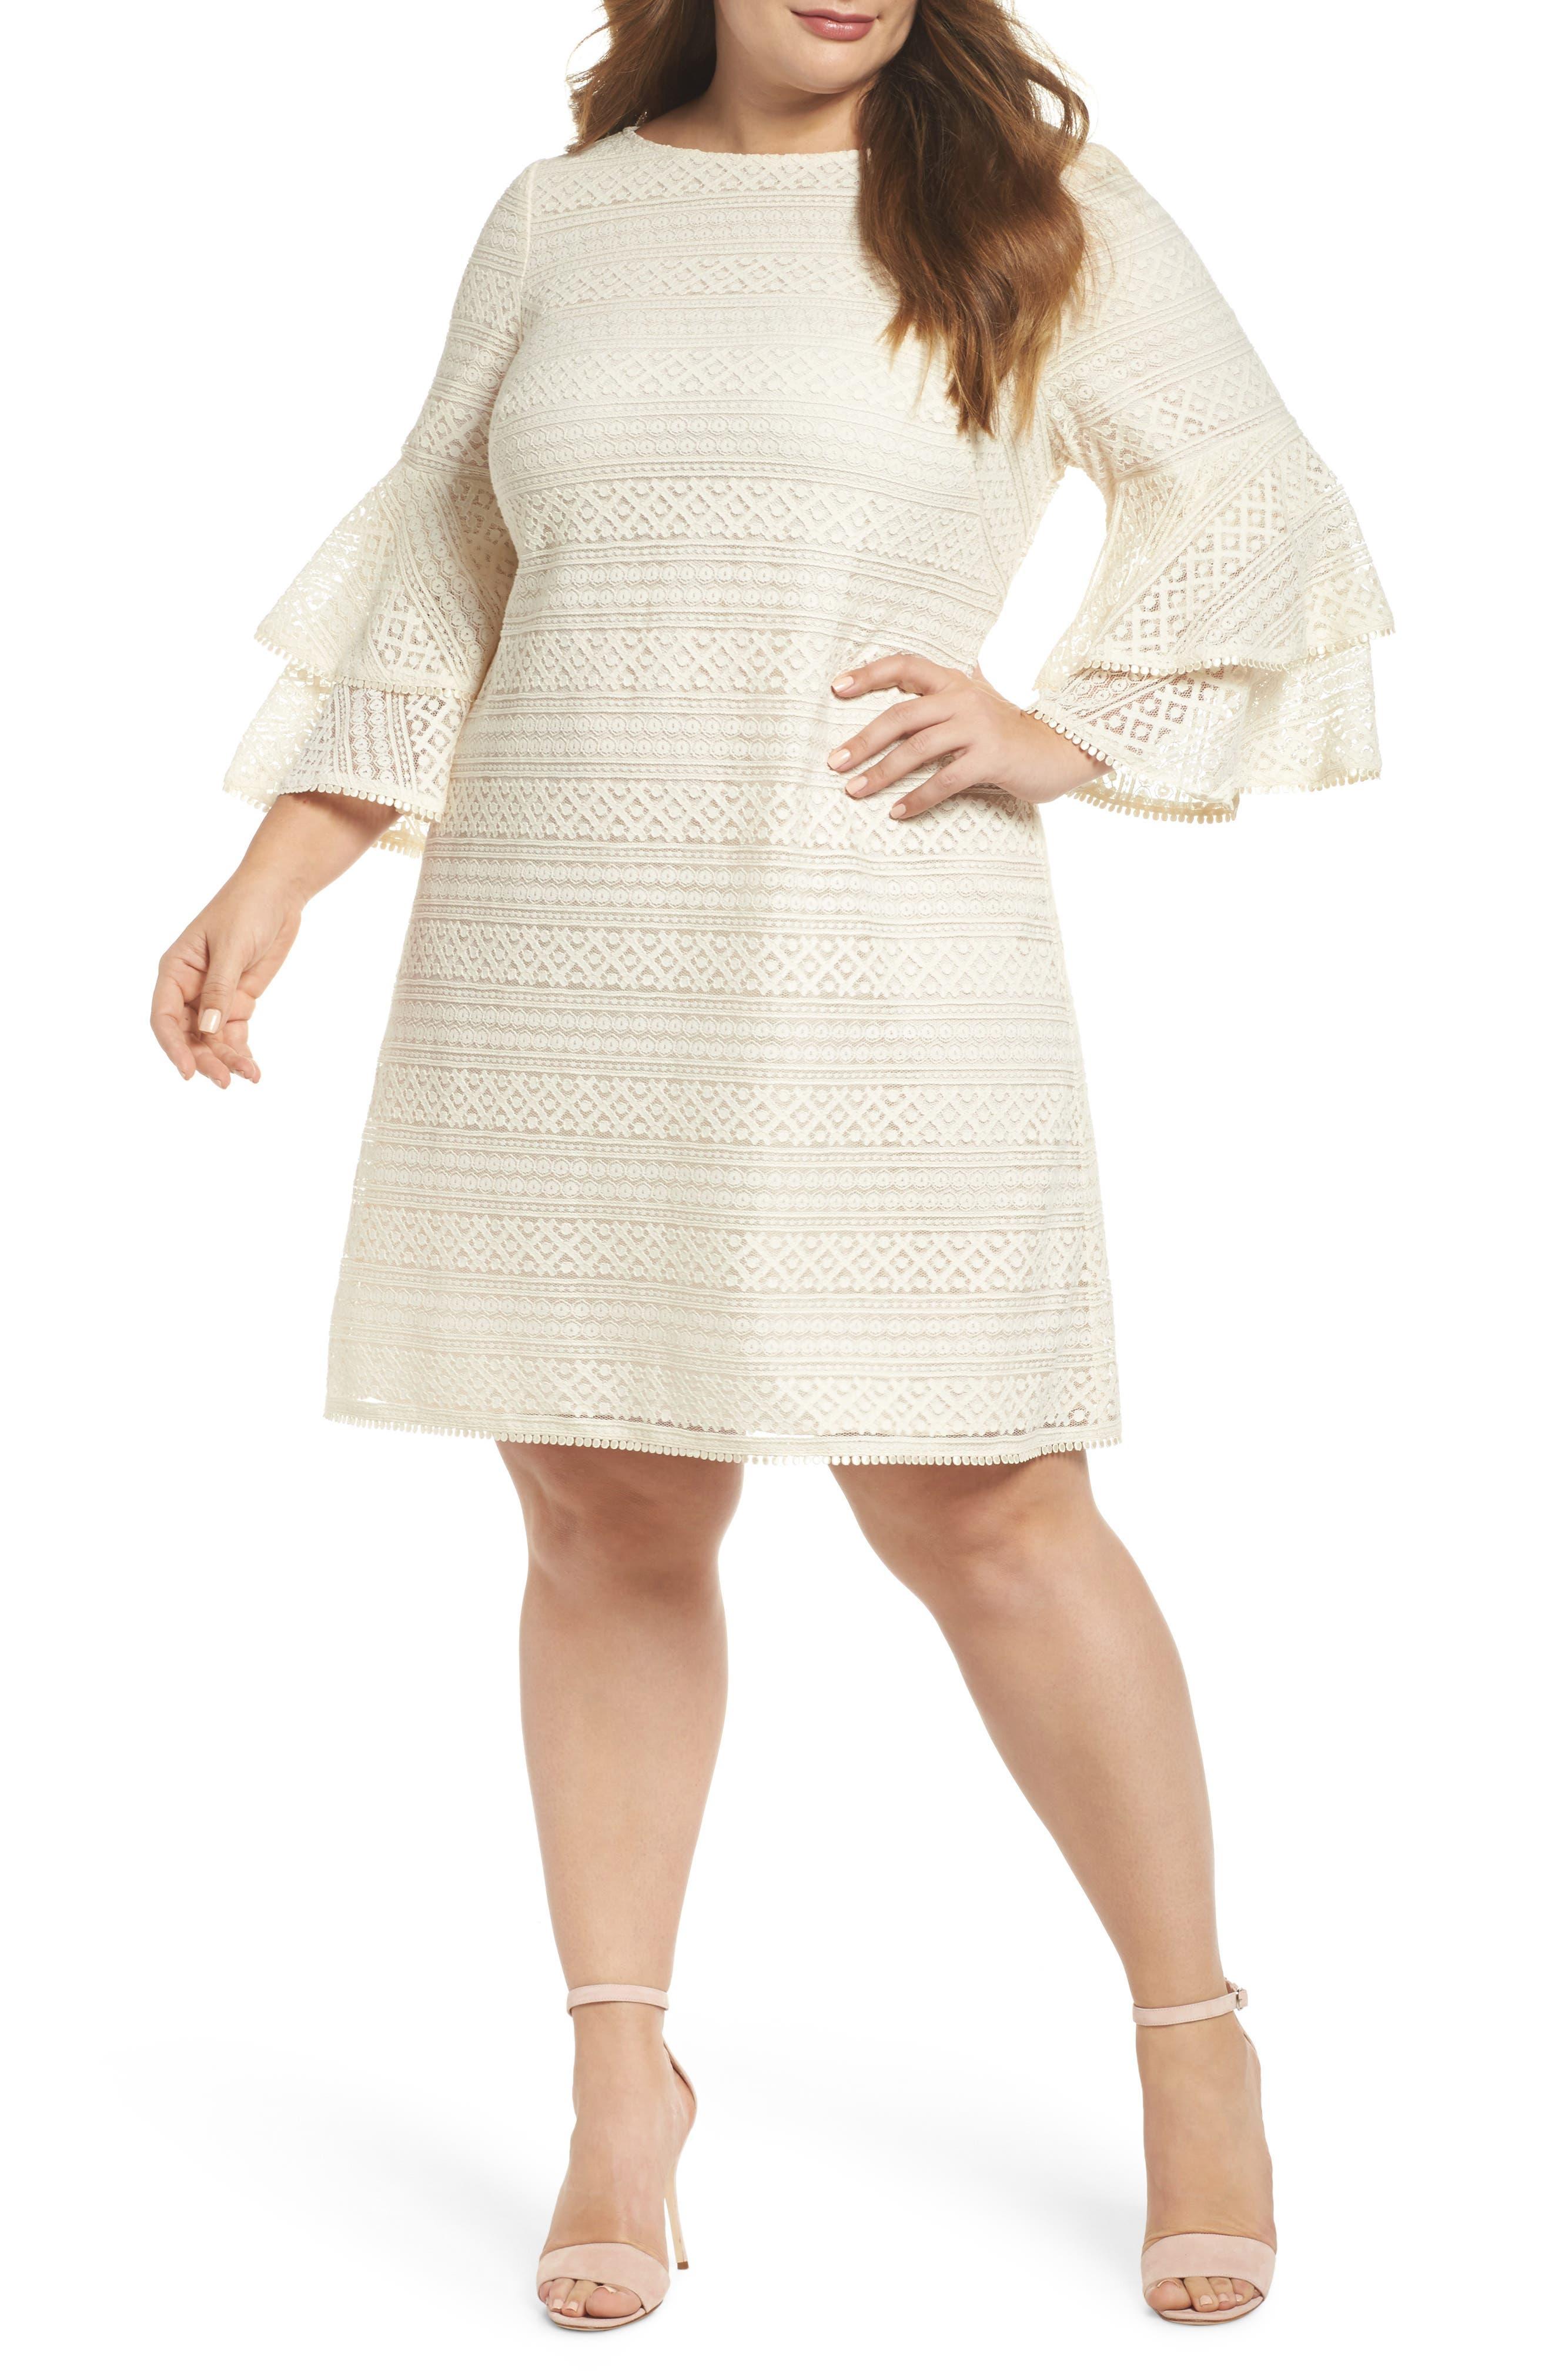 Bell Sleeve Lace Shift Dress,                             Main thumbnail 1, color,                             900